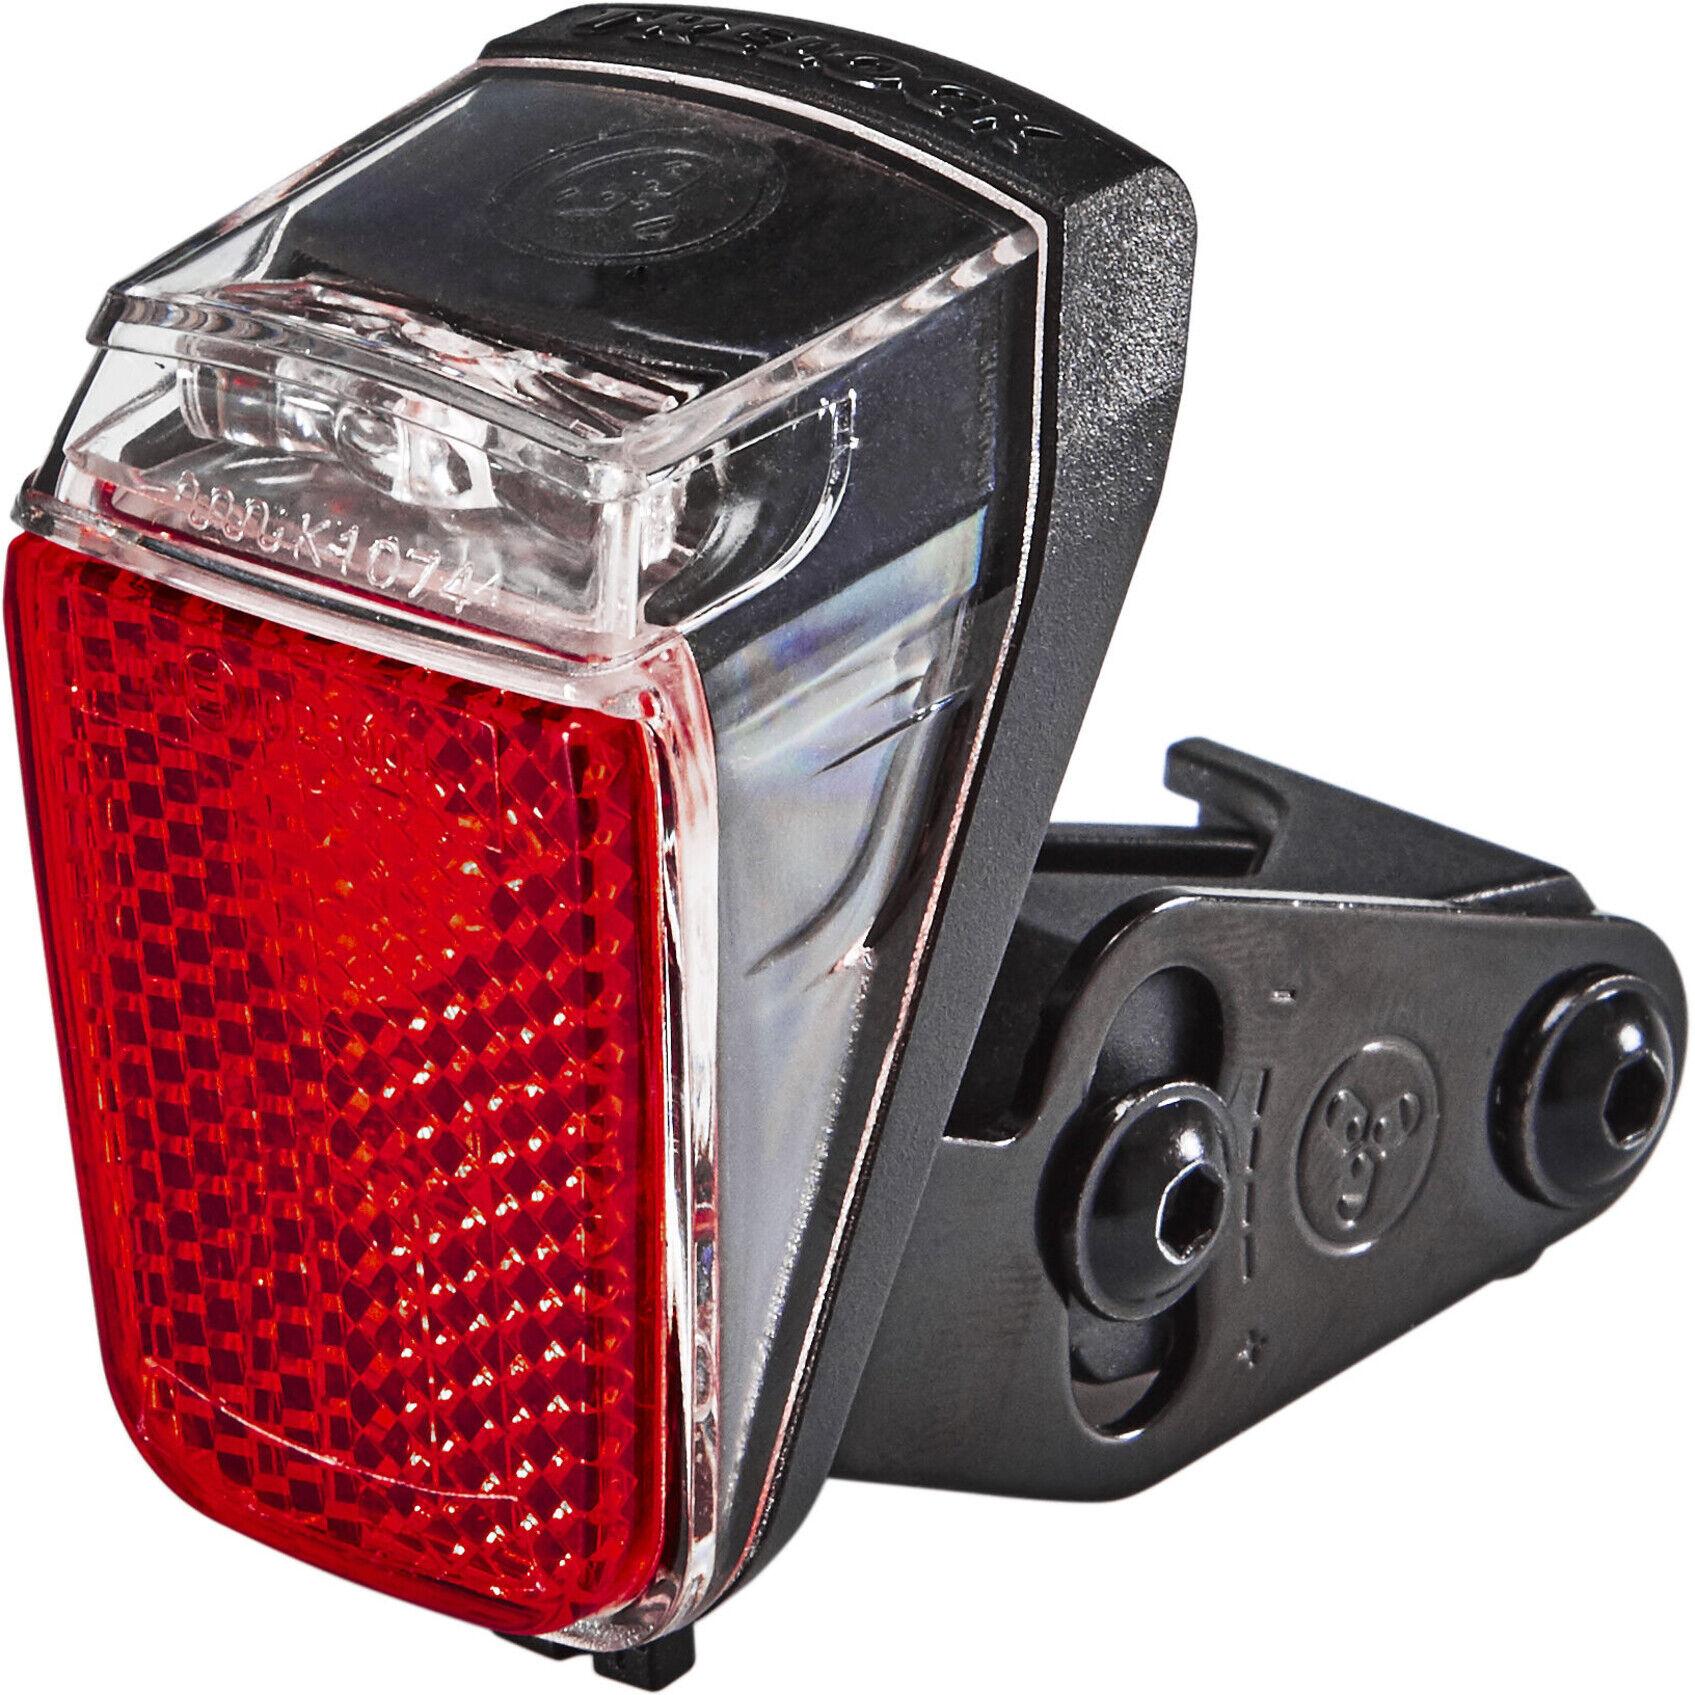 Trelock LS 710 LED Rücklicht mit StVZO Fahrrad Rückleuchte